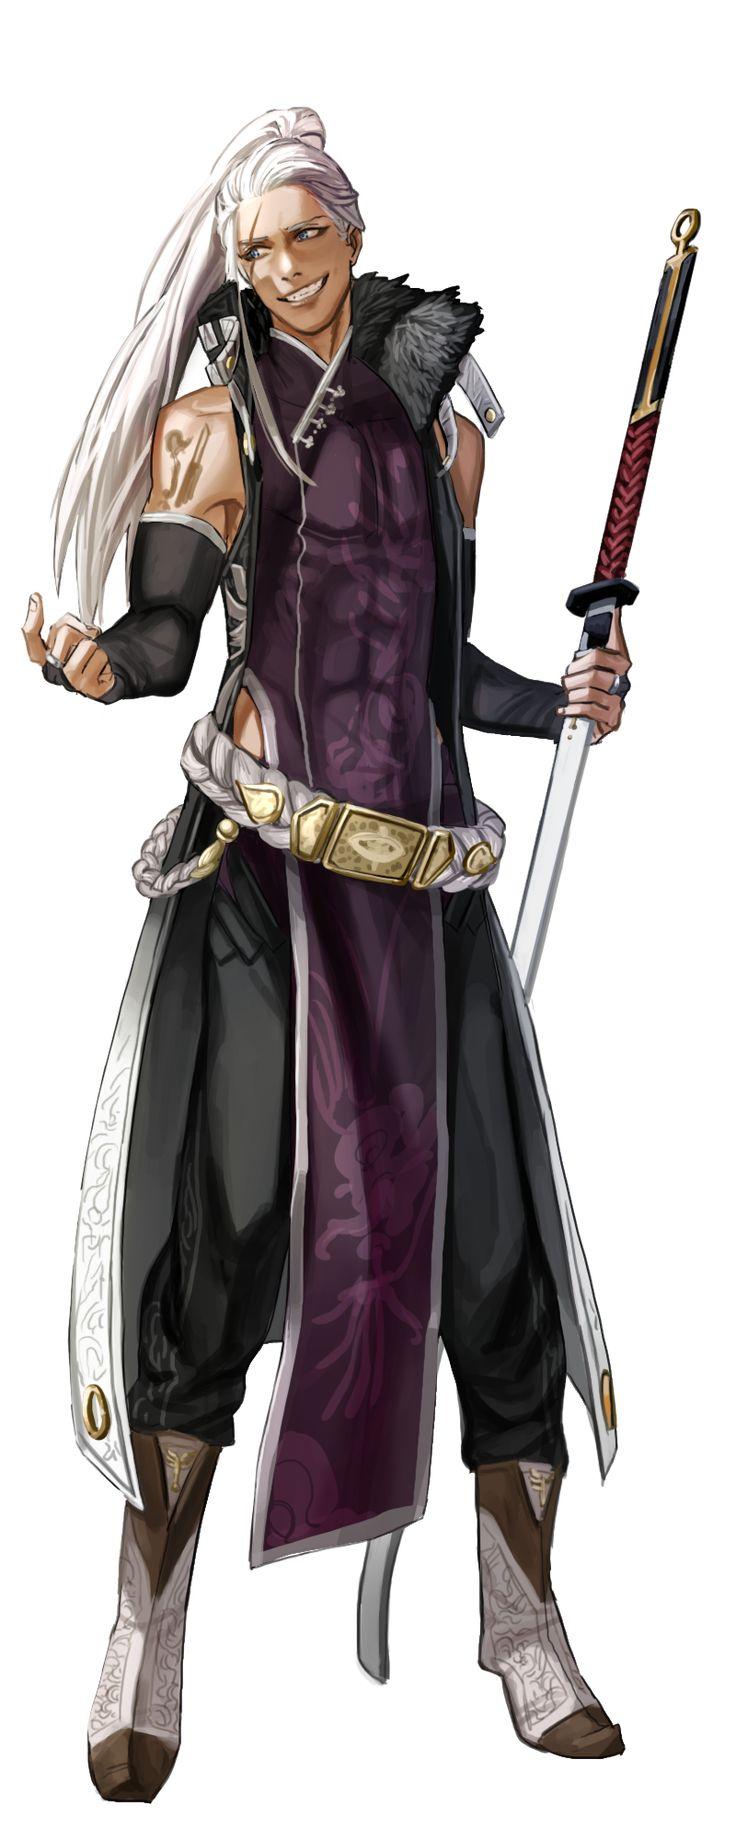 lurian (hombre lobo guerrero/luchador)